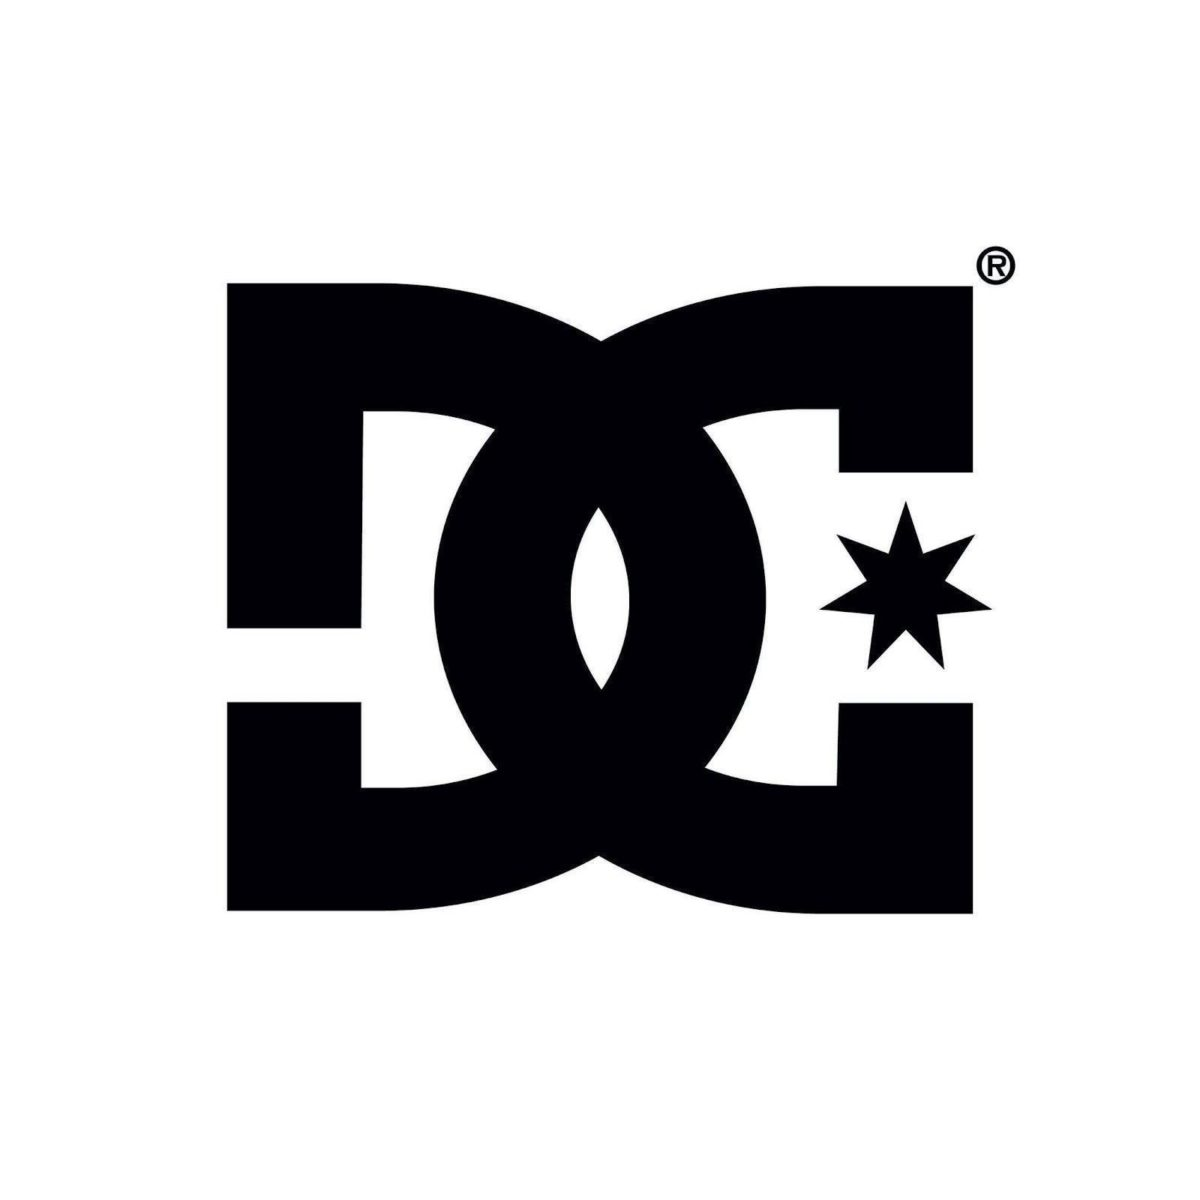 wallpaper: Wallpapers Dc Shoes Logo